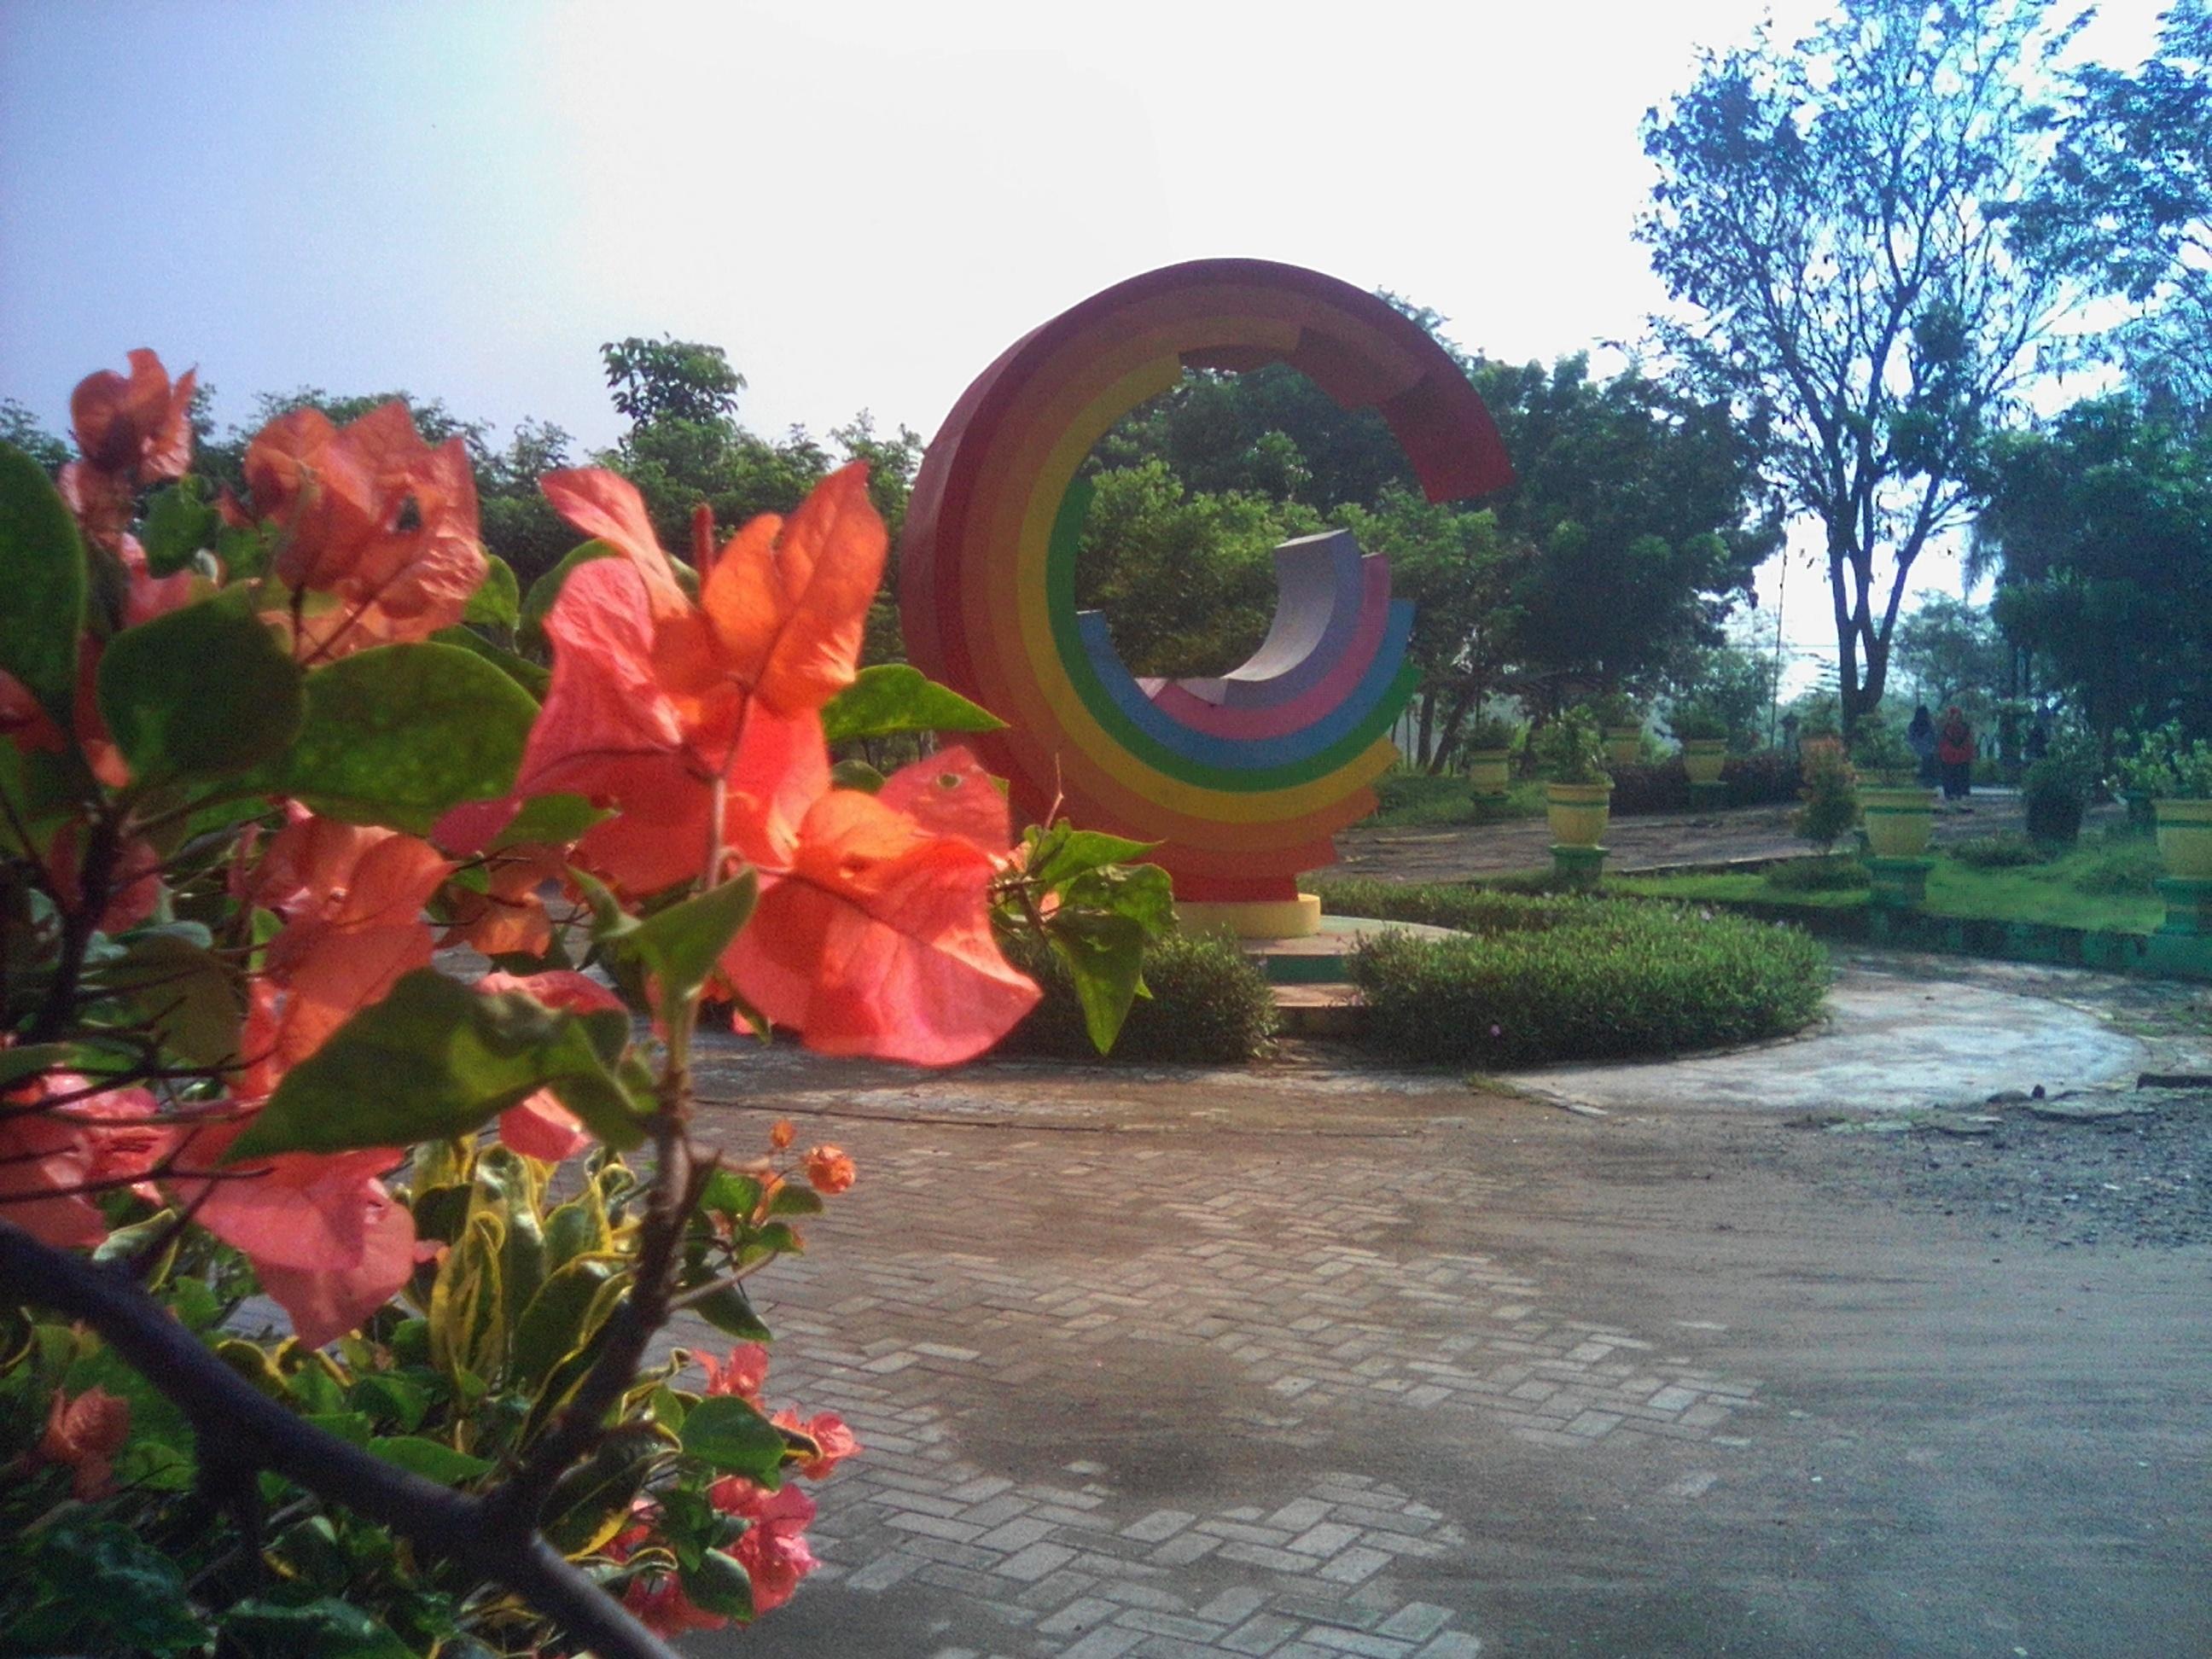 Serunya Pekan Rekreatif Rth Kebon Ratu Mading Sdit Arj Ruang